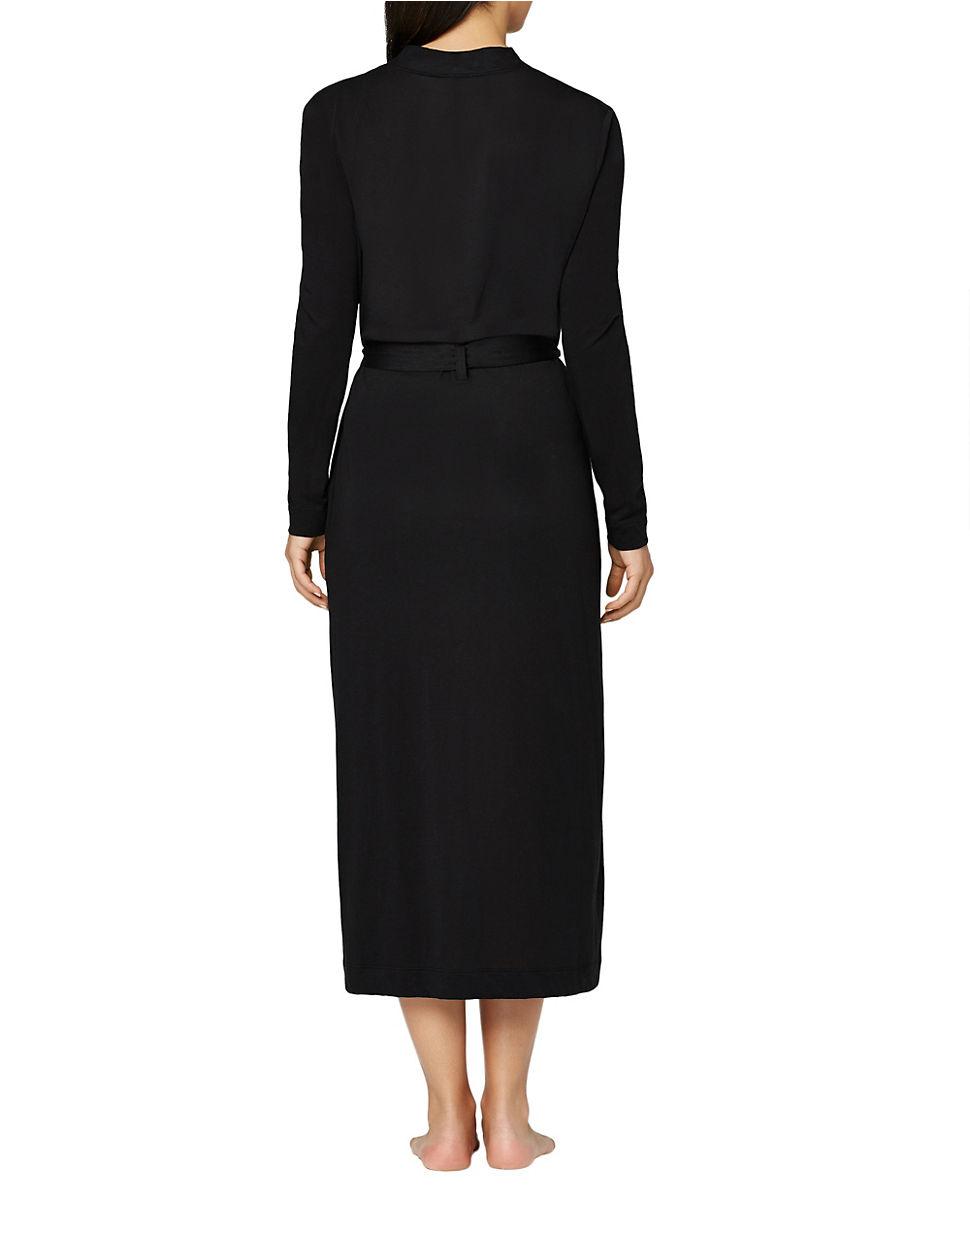 Lyst - Yummie By Heather Thomson Pima Jersey Long Robe in Black 668632ed6